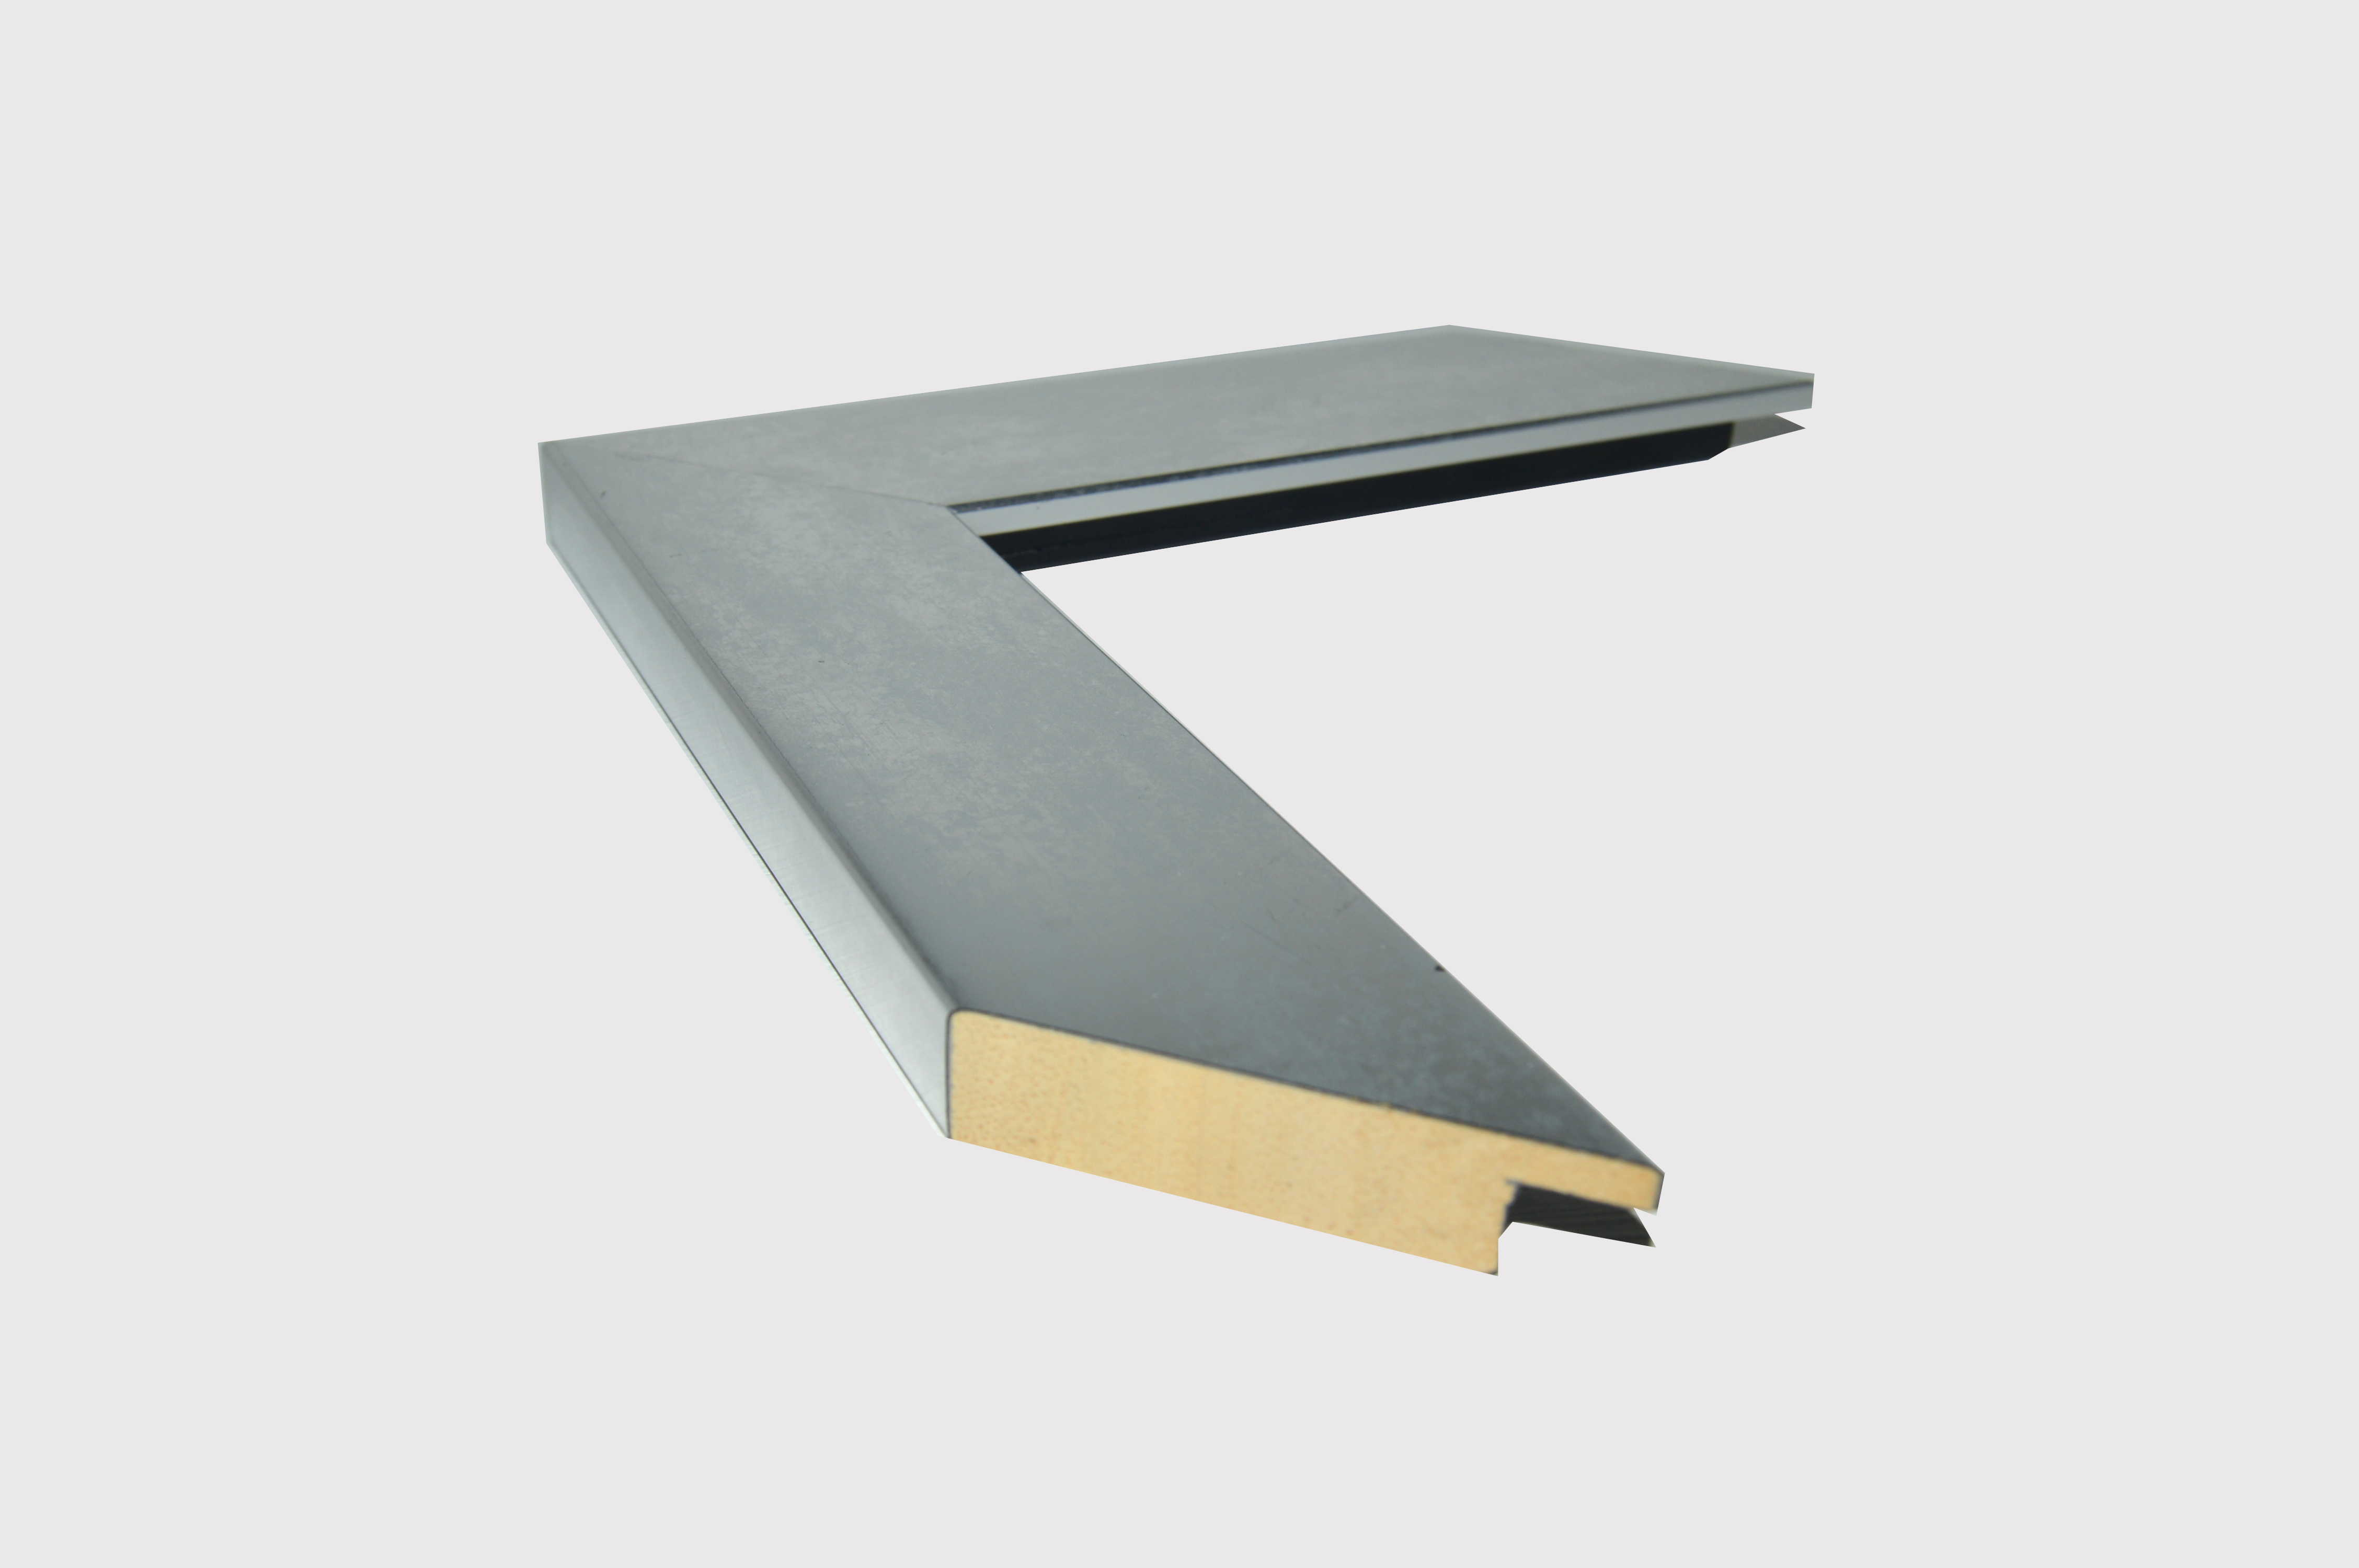 00468-770-PLATA-ancho4.2cm-perfil